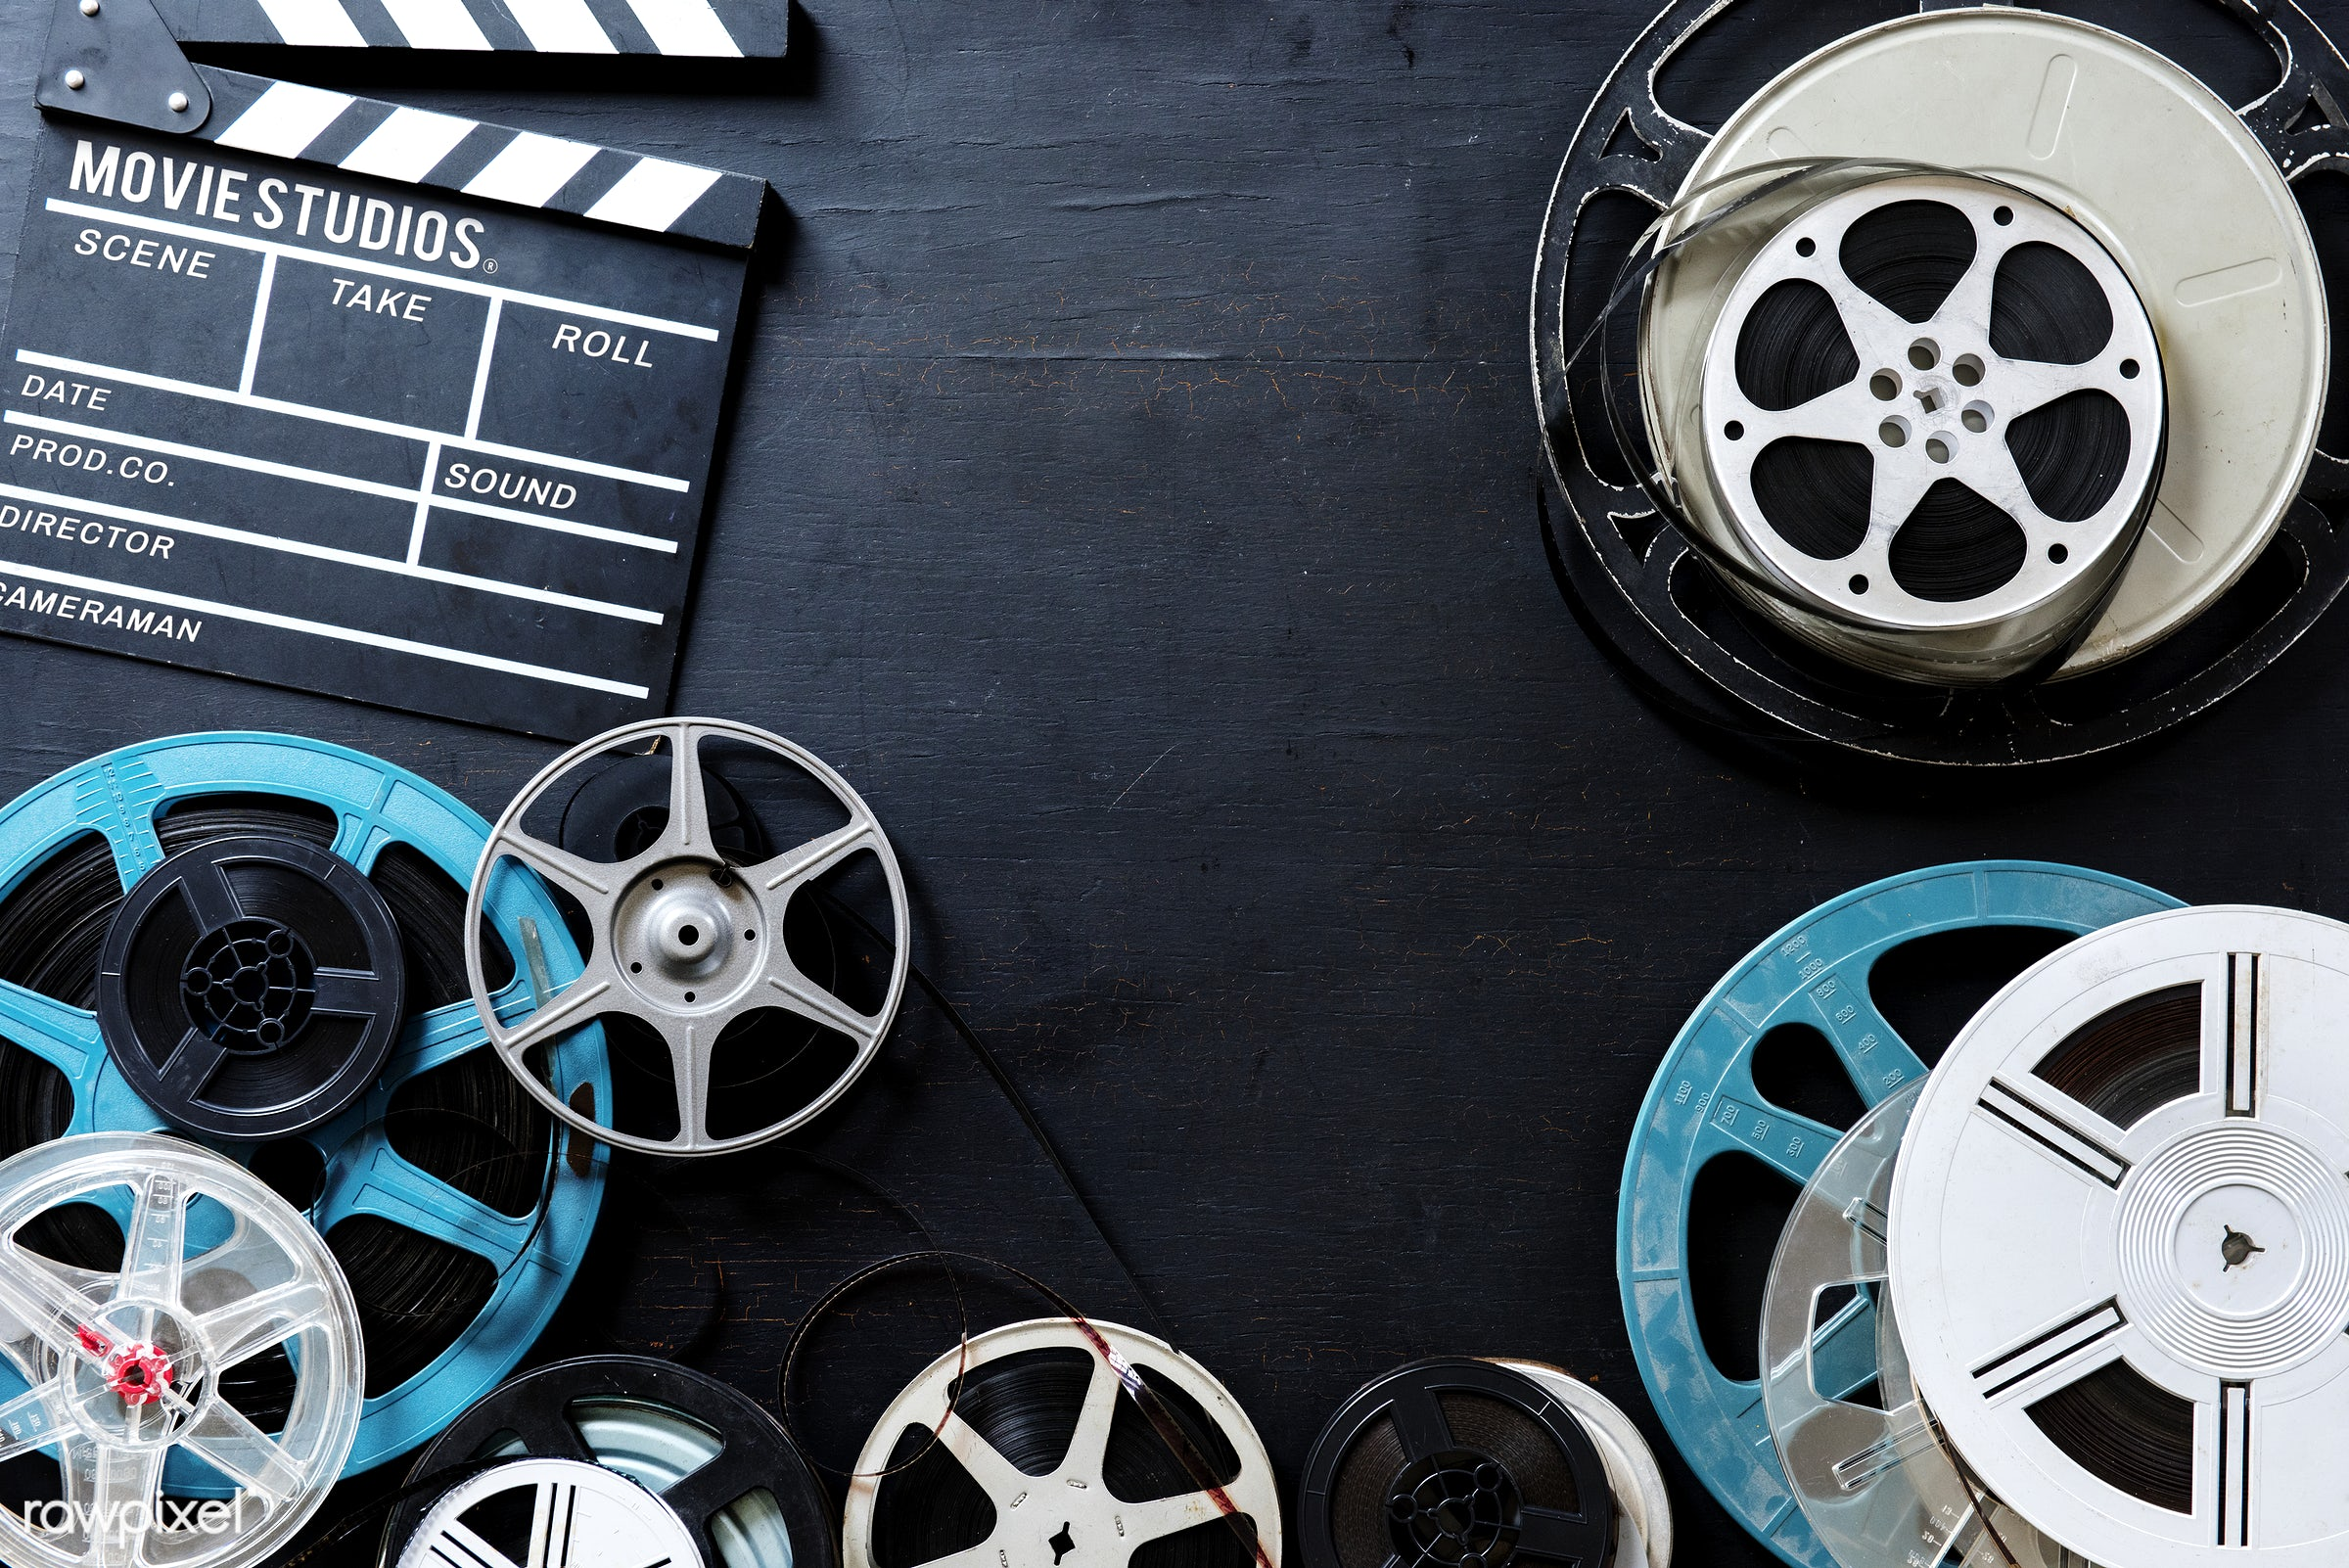 Retro video film rolls - cinema, film, video, movie, action, analog, antique, entertainment, equipment, film strip, industry...